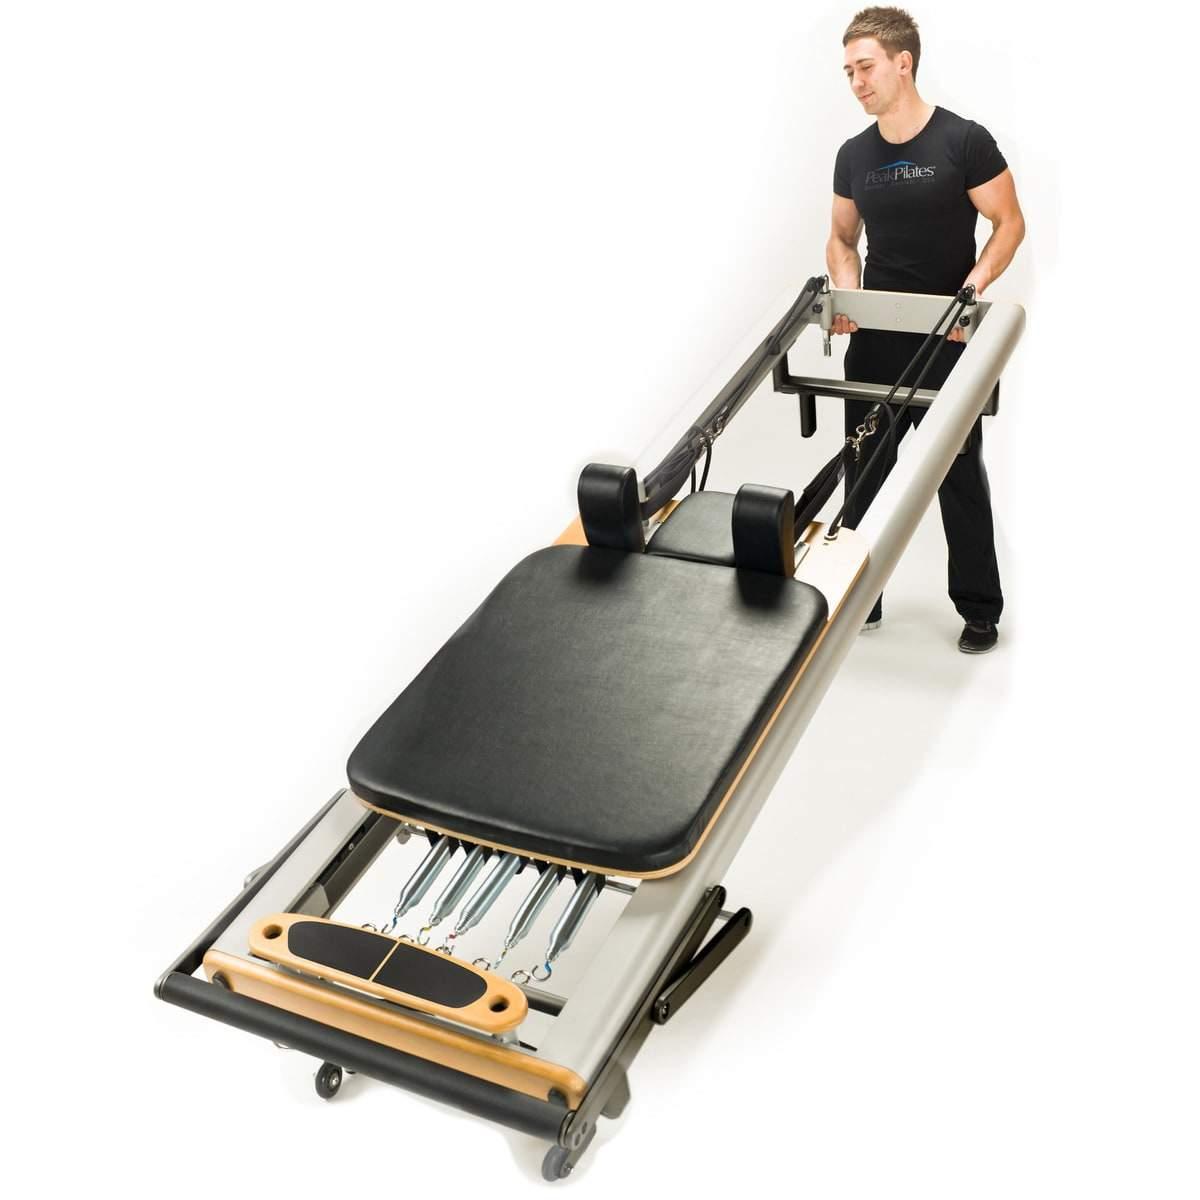 Peak Pilates Fit Reformer